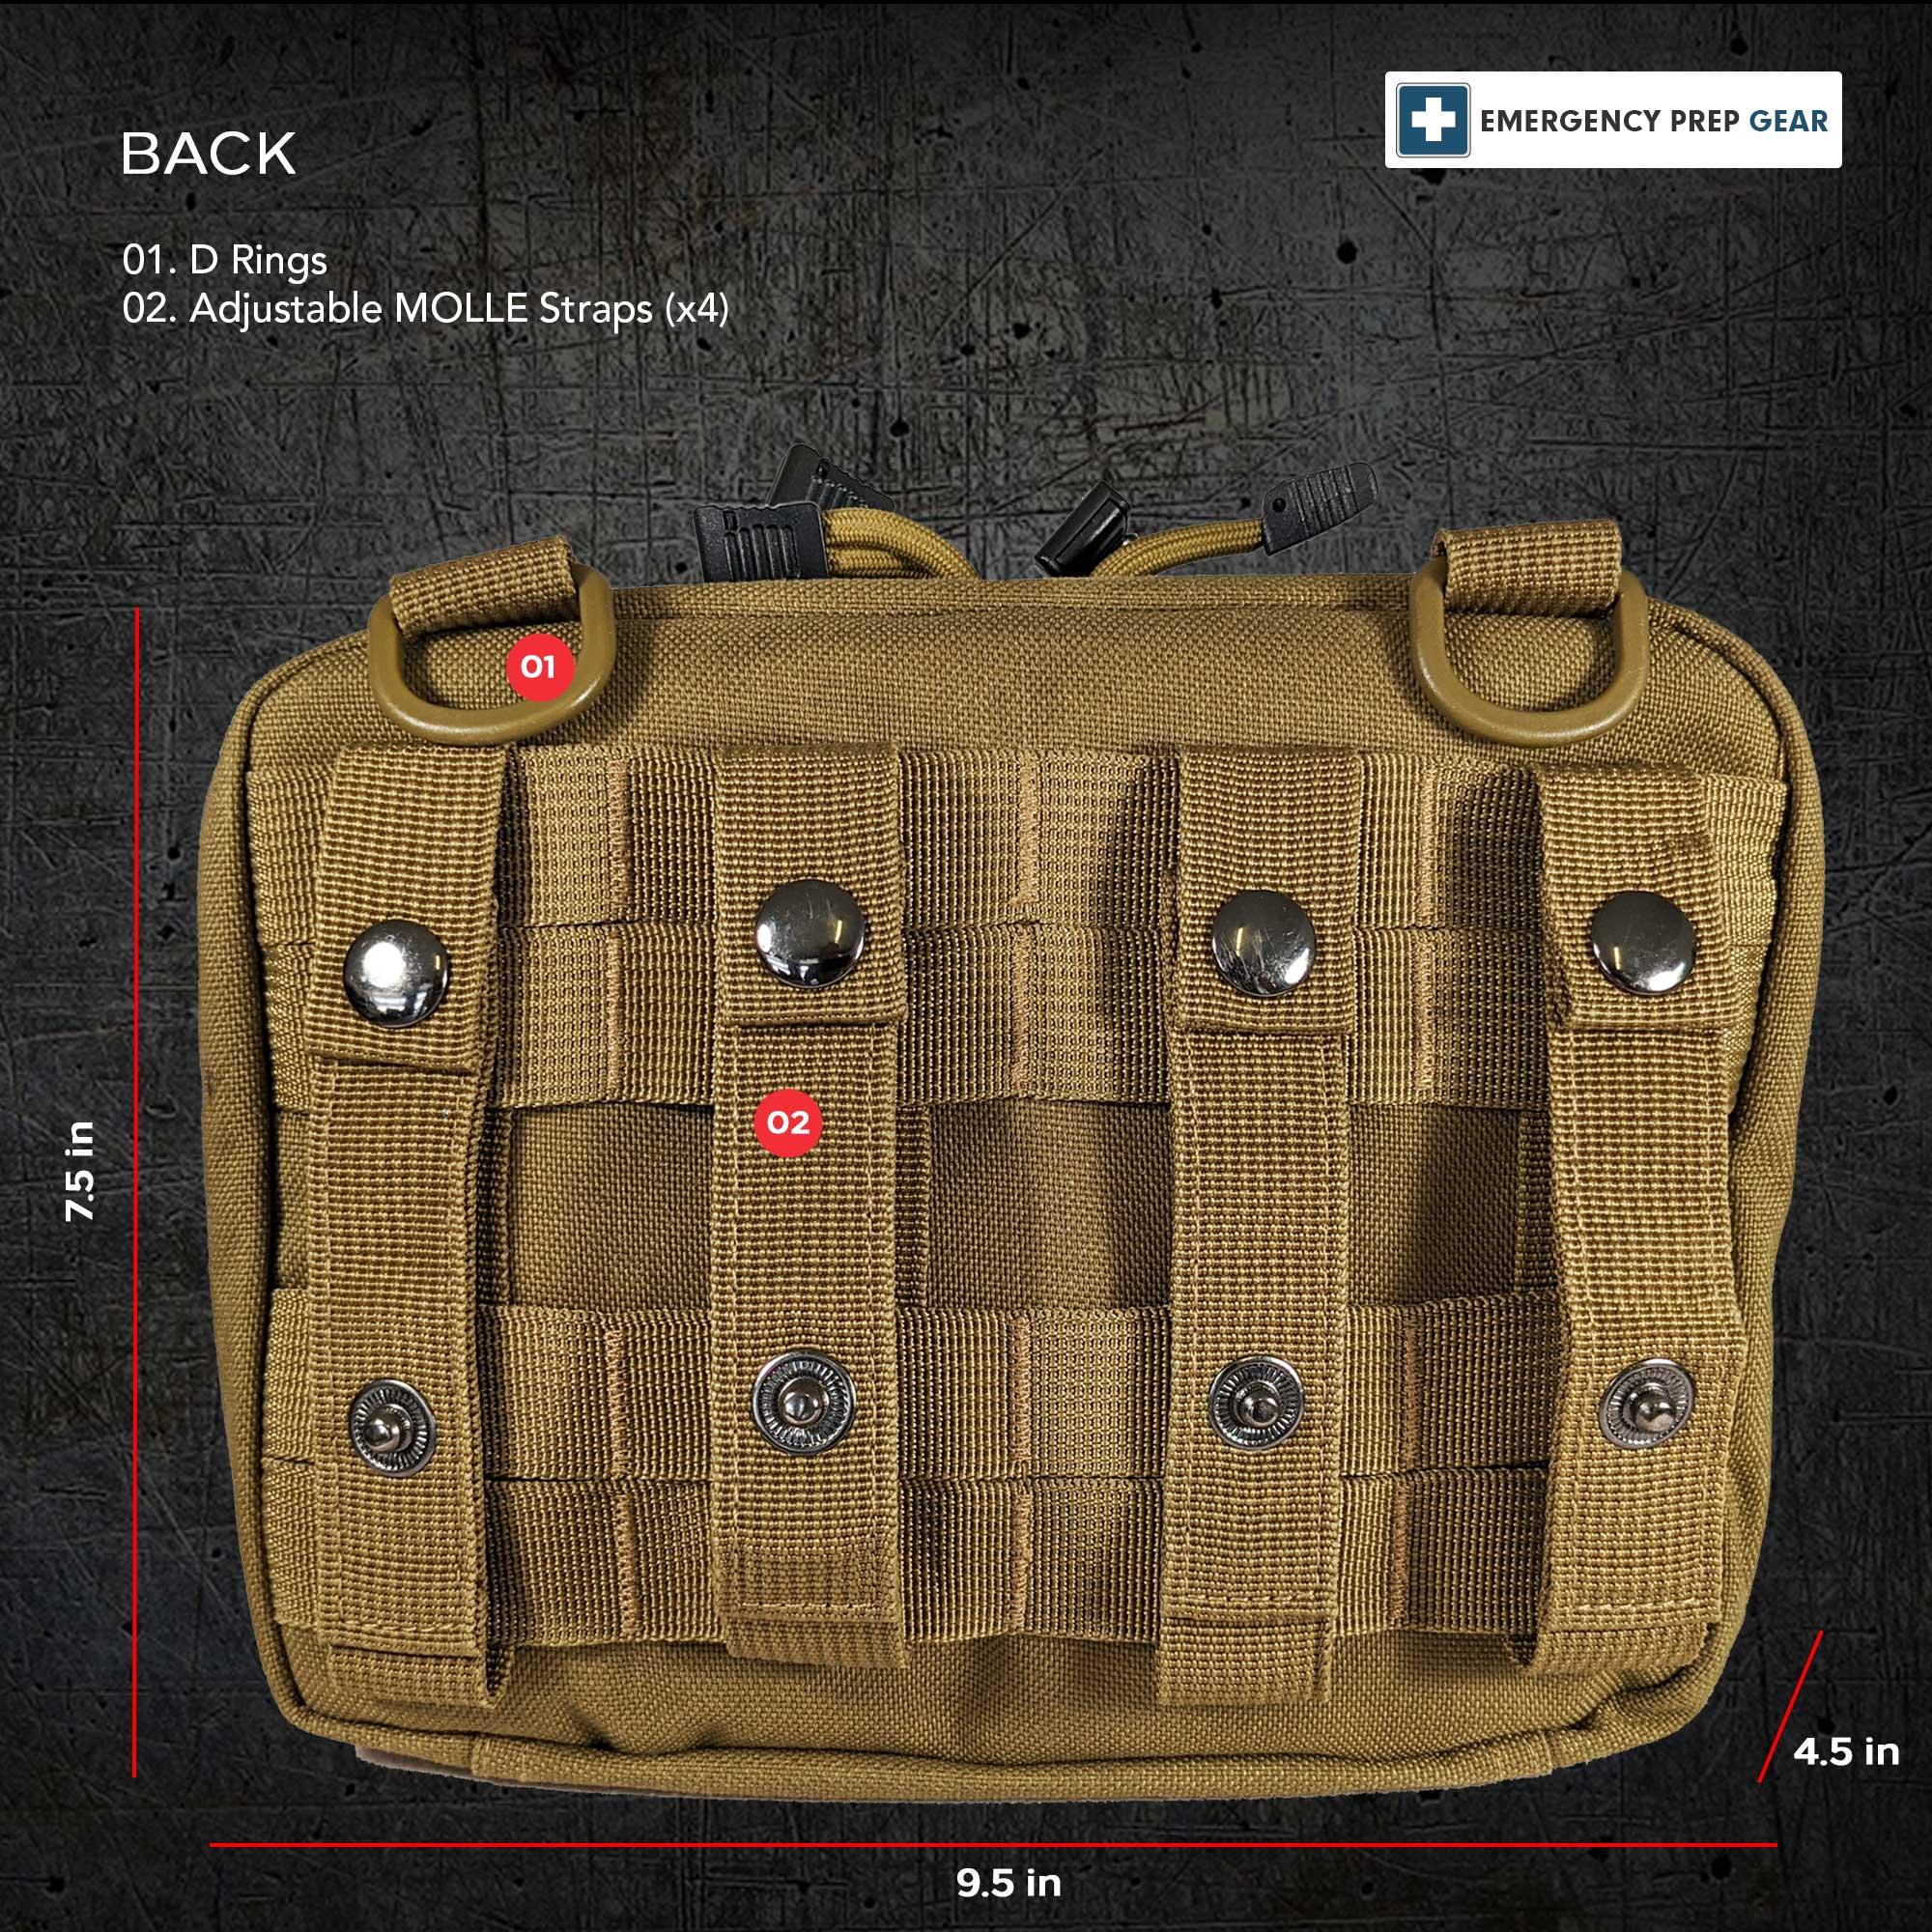 21 10 08 16 22 02 original b09dqz9vnl epg gear tan back